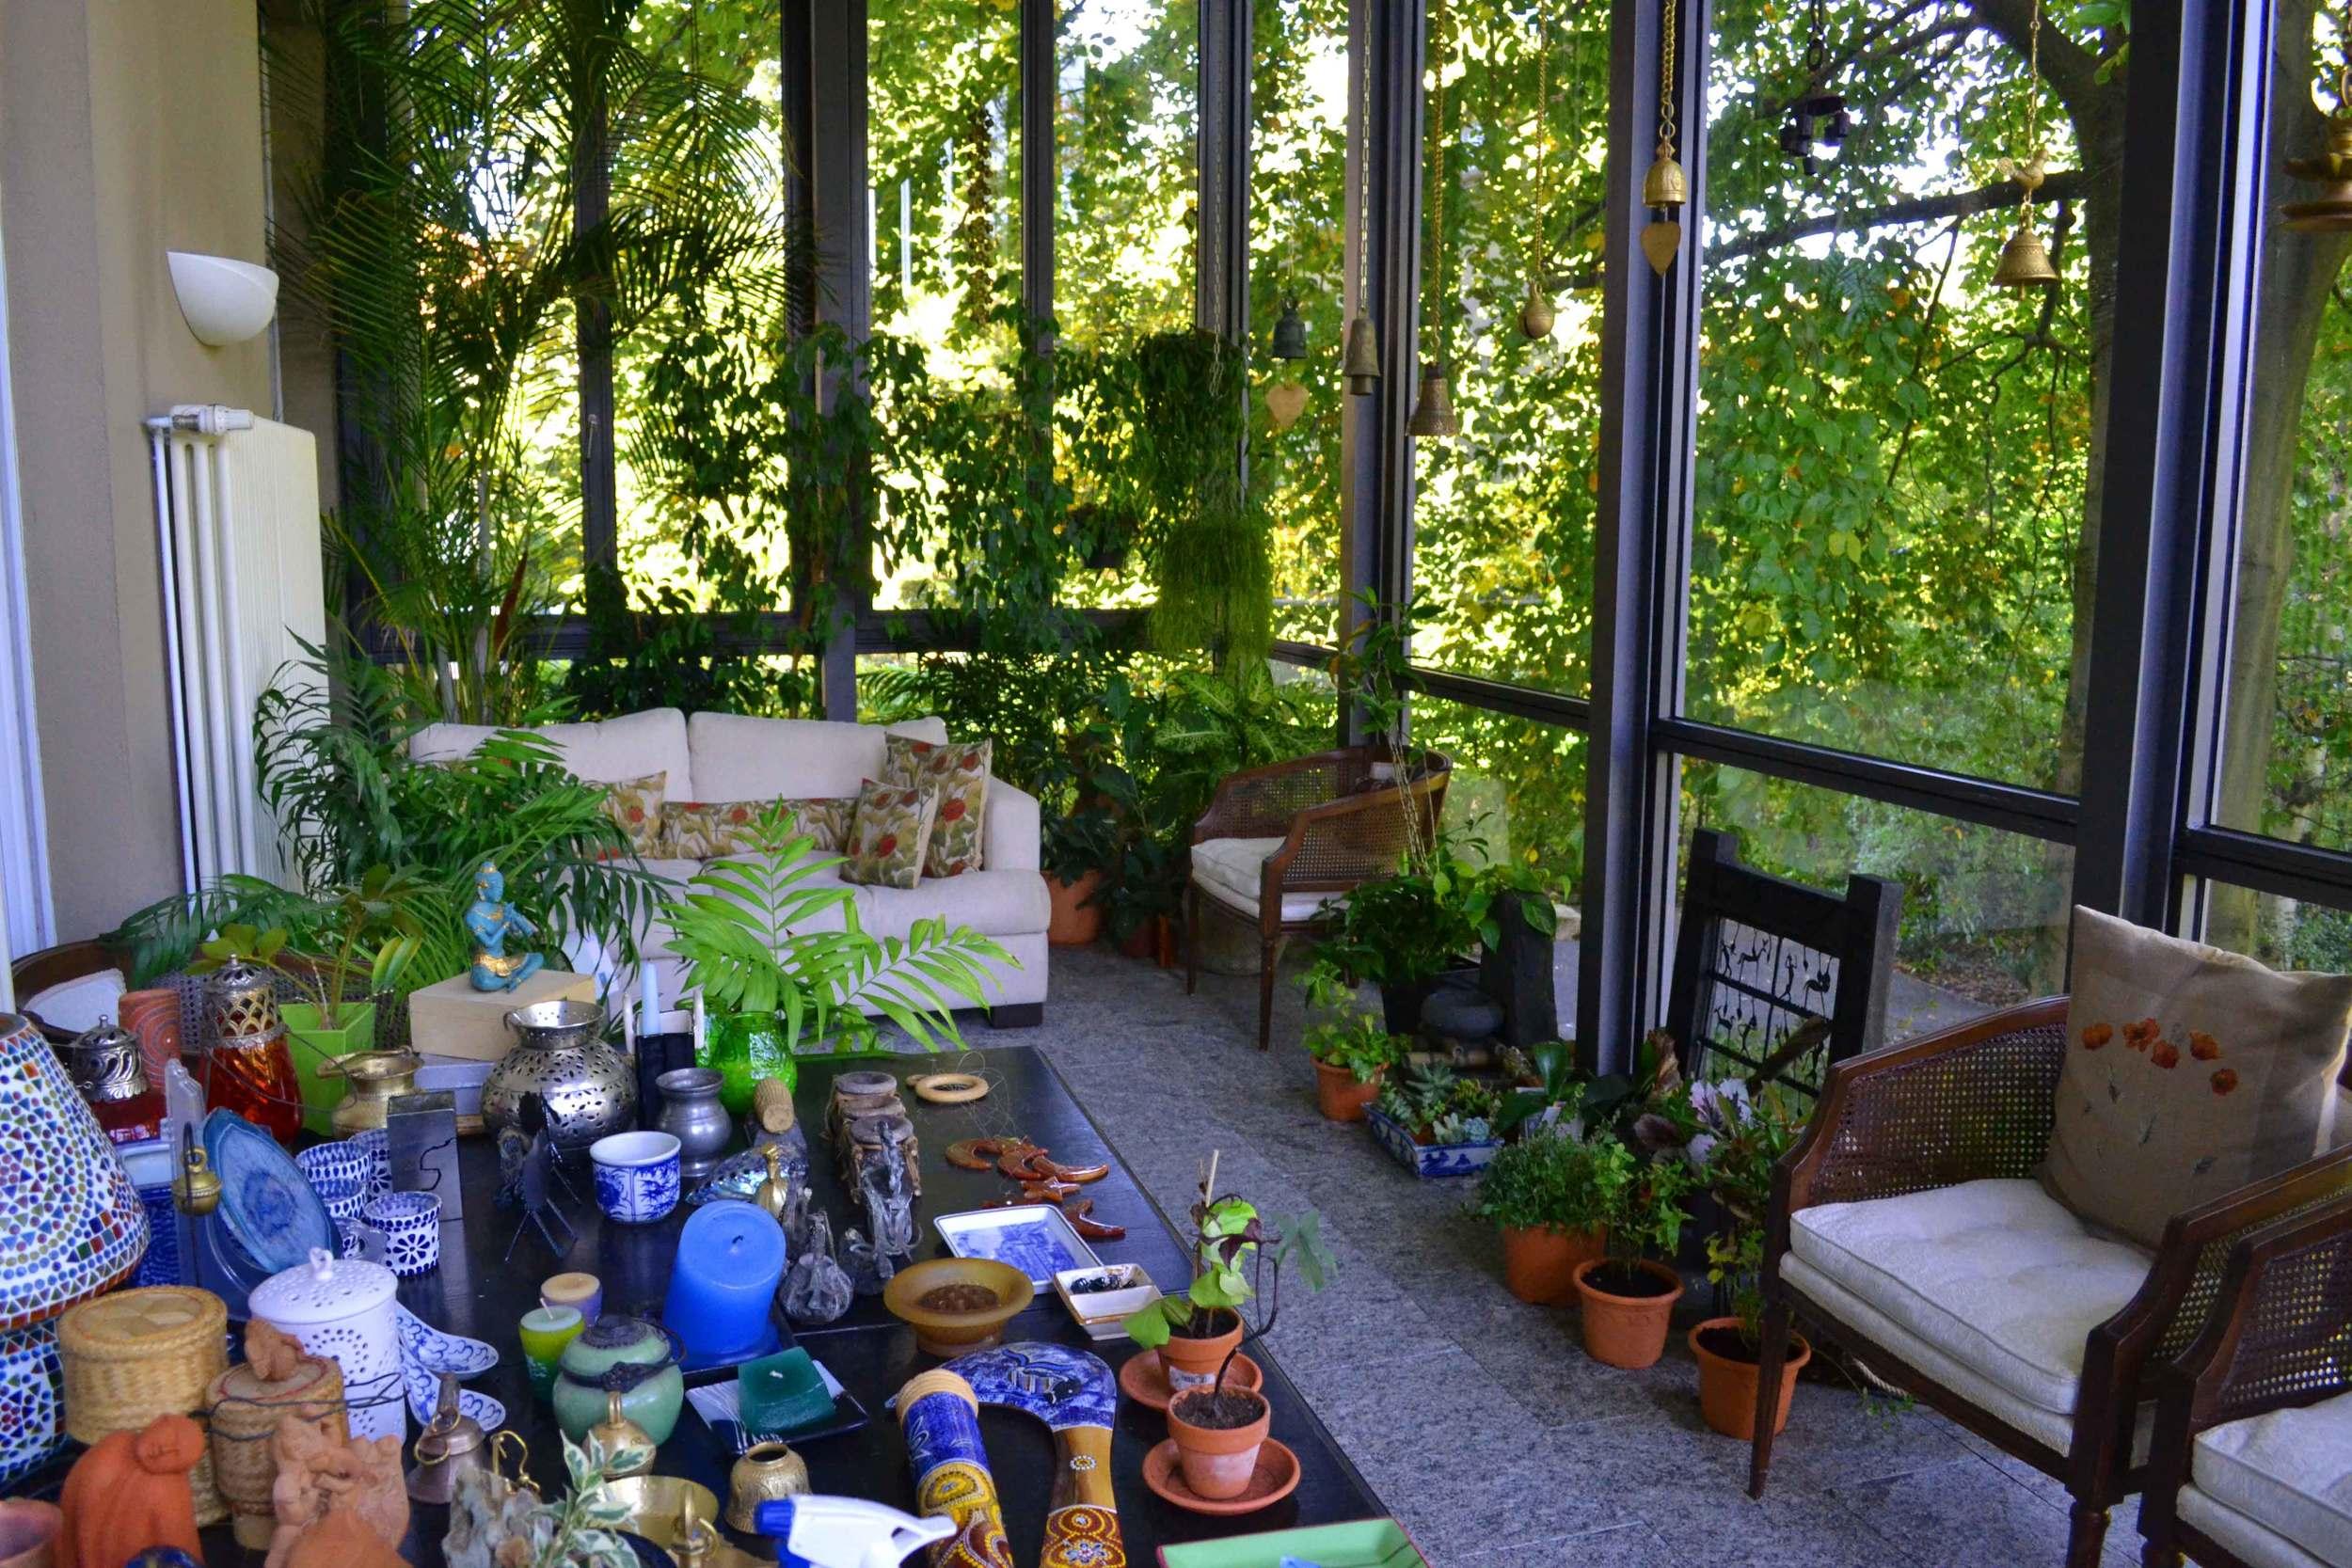 I wonder how it is to sit in this glass walled verandah when it snows! Image©gunjanvirk